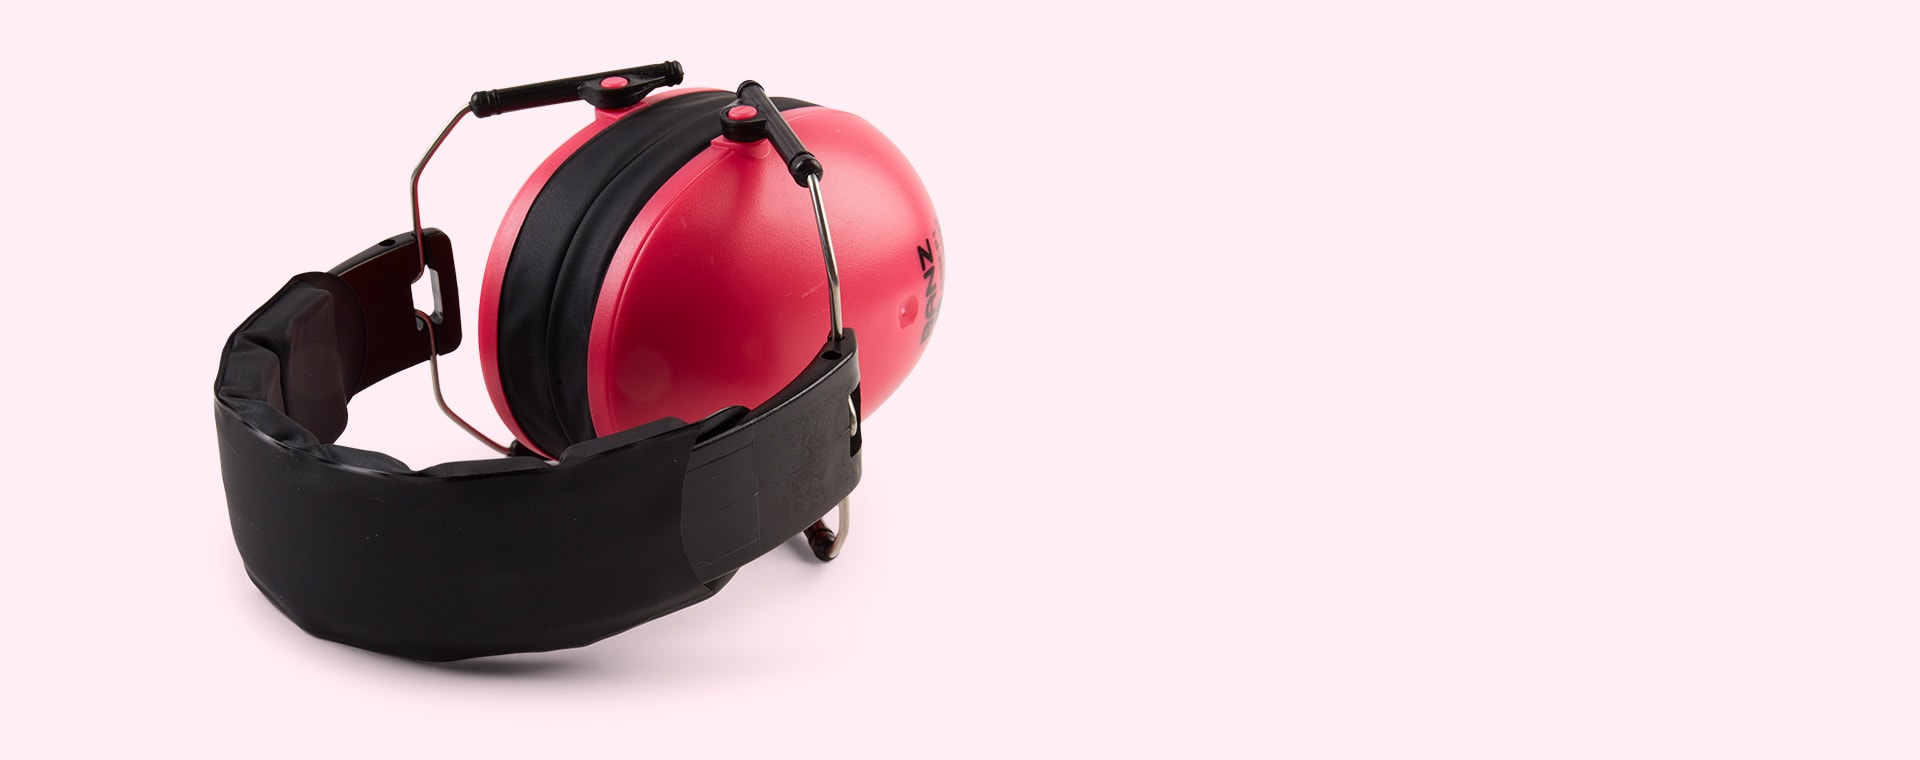 Pink Banz Kidz Ear Defenders